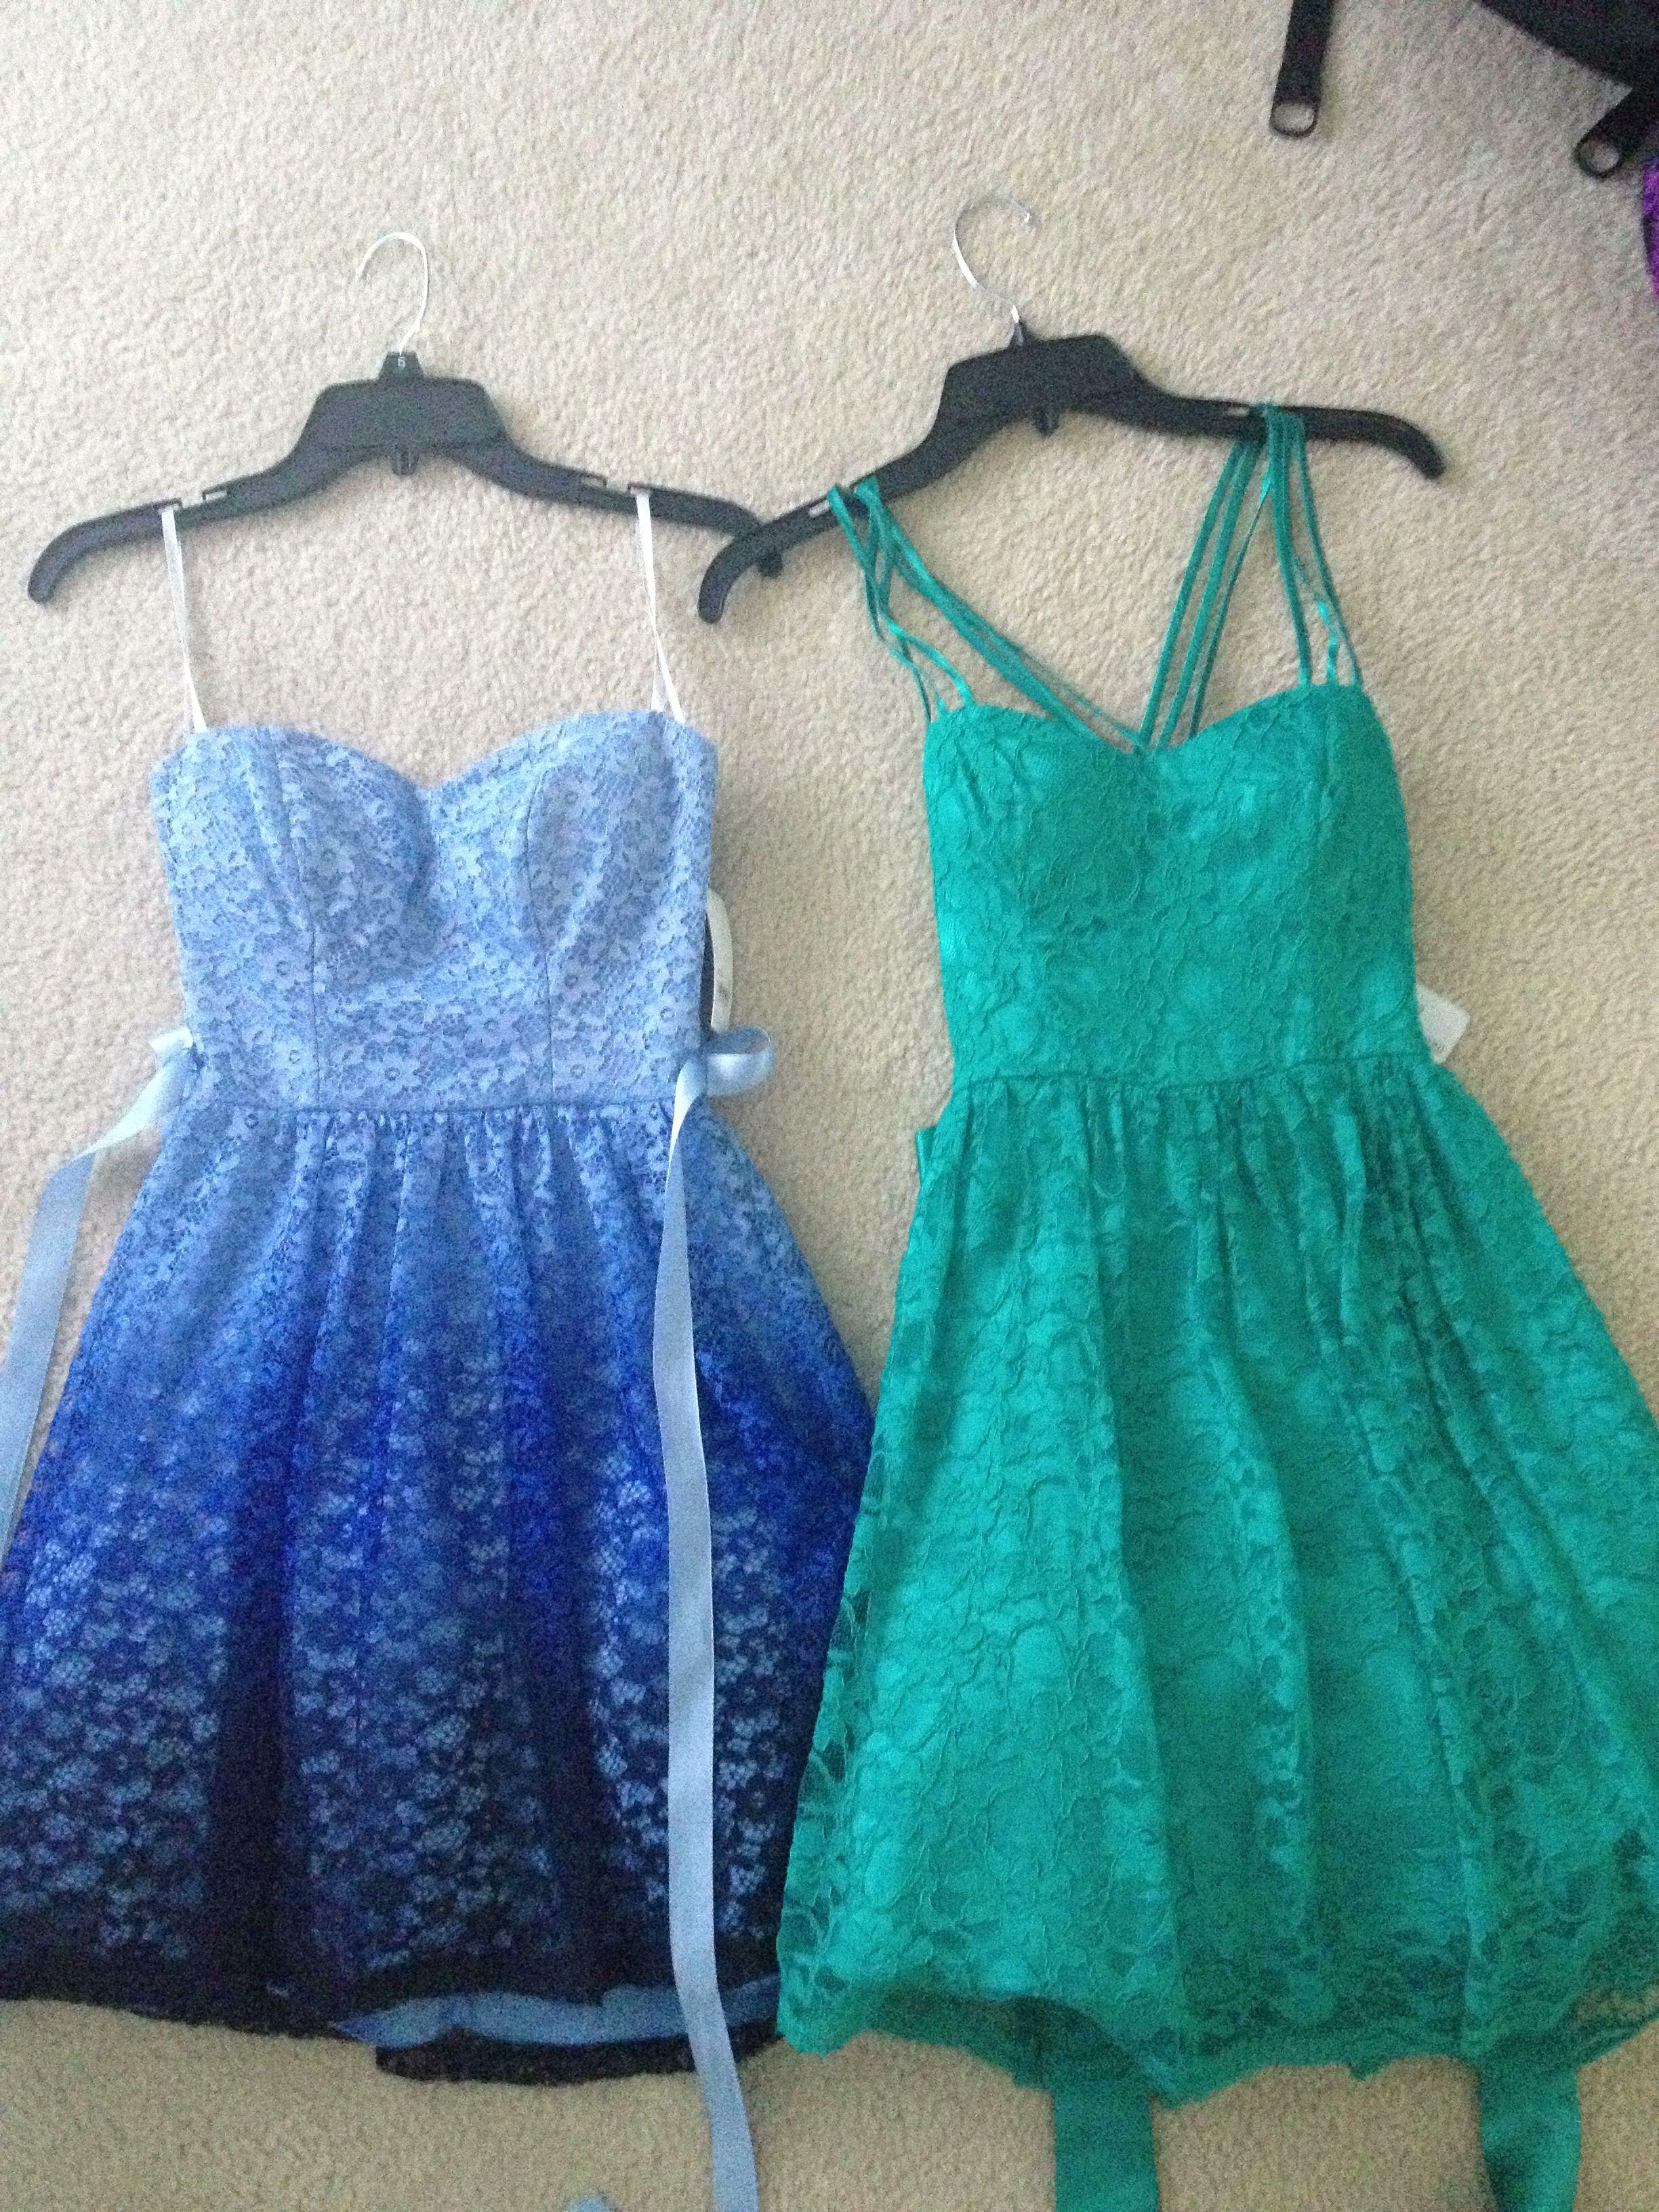 My Dresses Graduation Dress Dresses Cute Dresses [ 3264 x 2448 Pixel ]